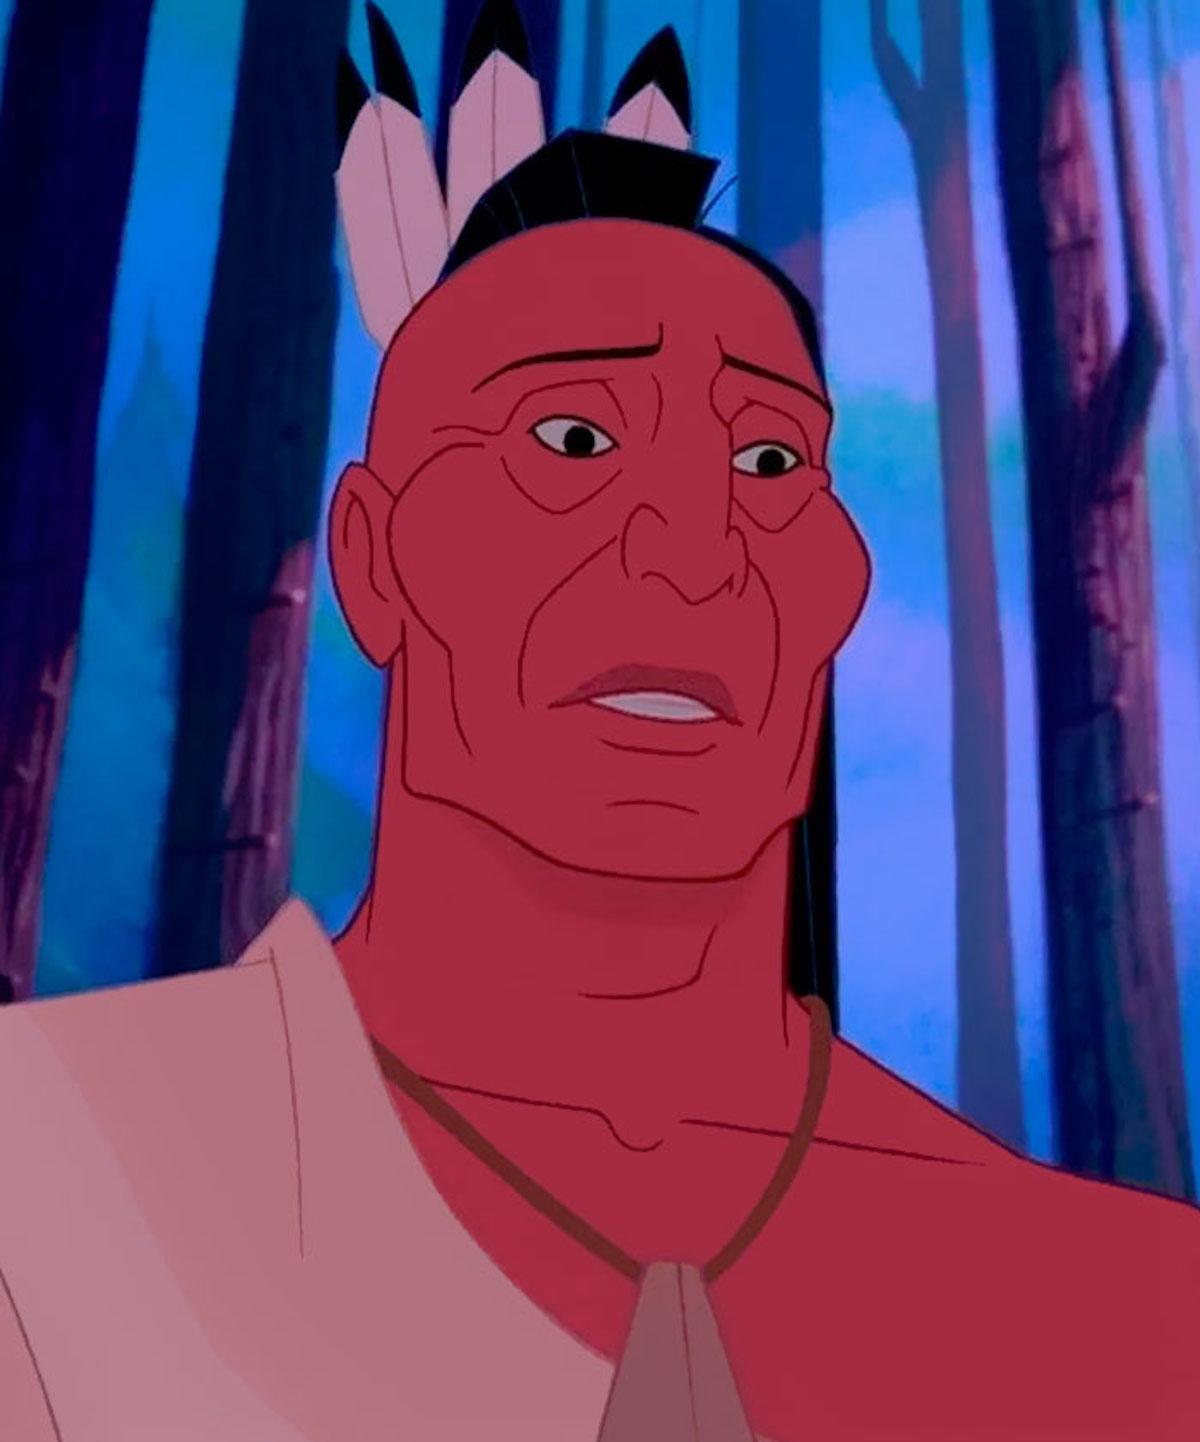 Illustrations Chef Powhatan père de Pocahontas Jirka Väätäinen